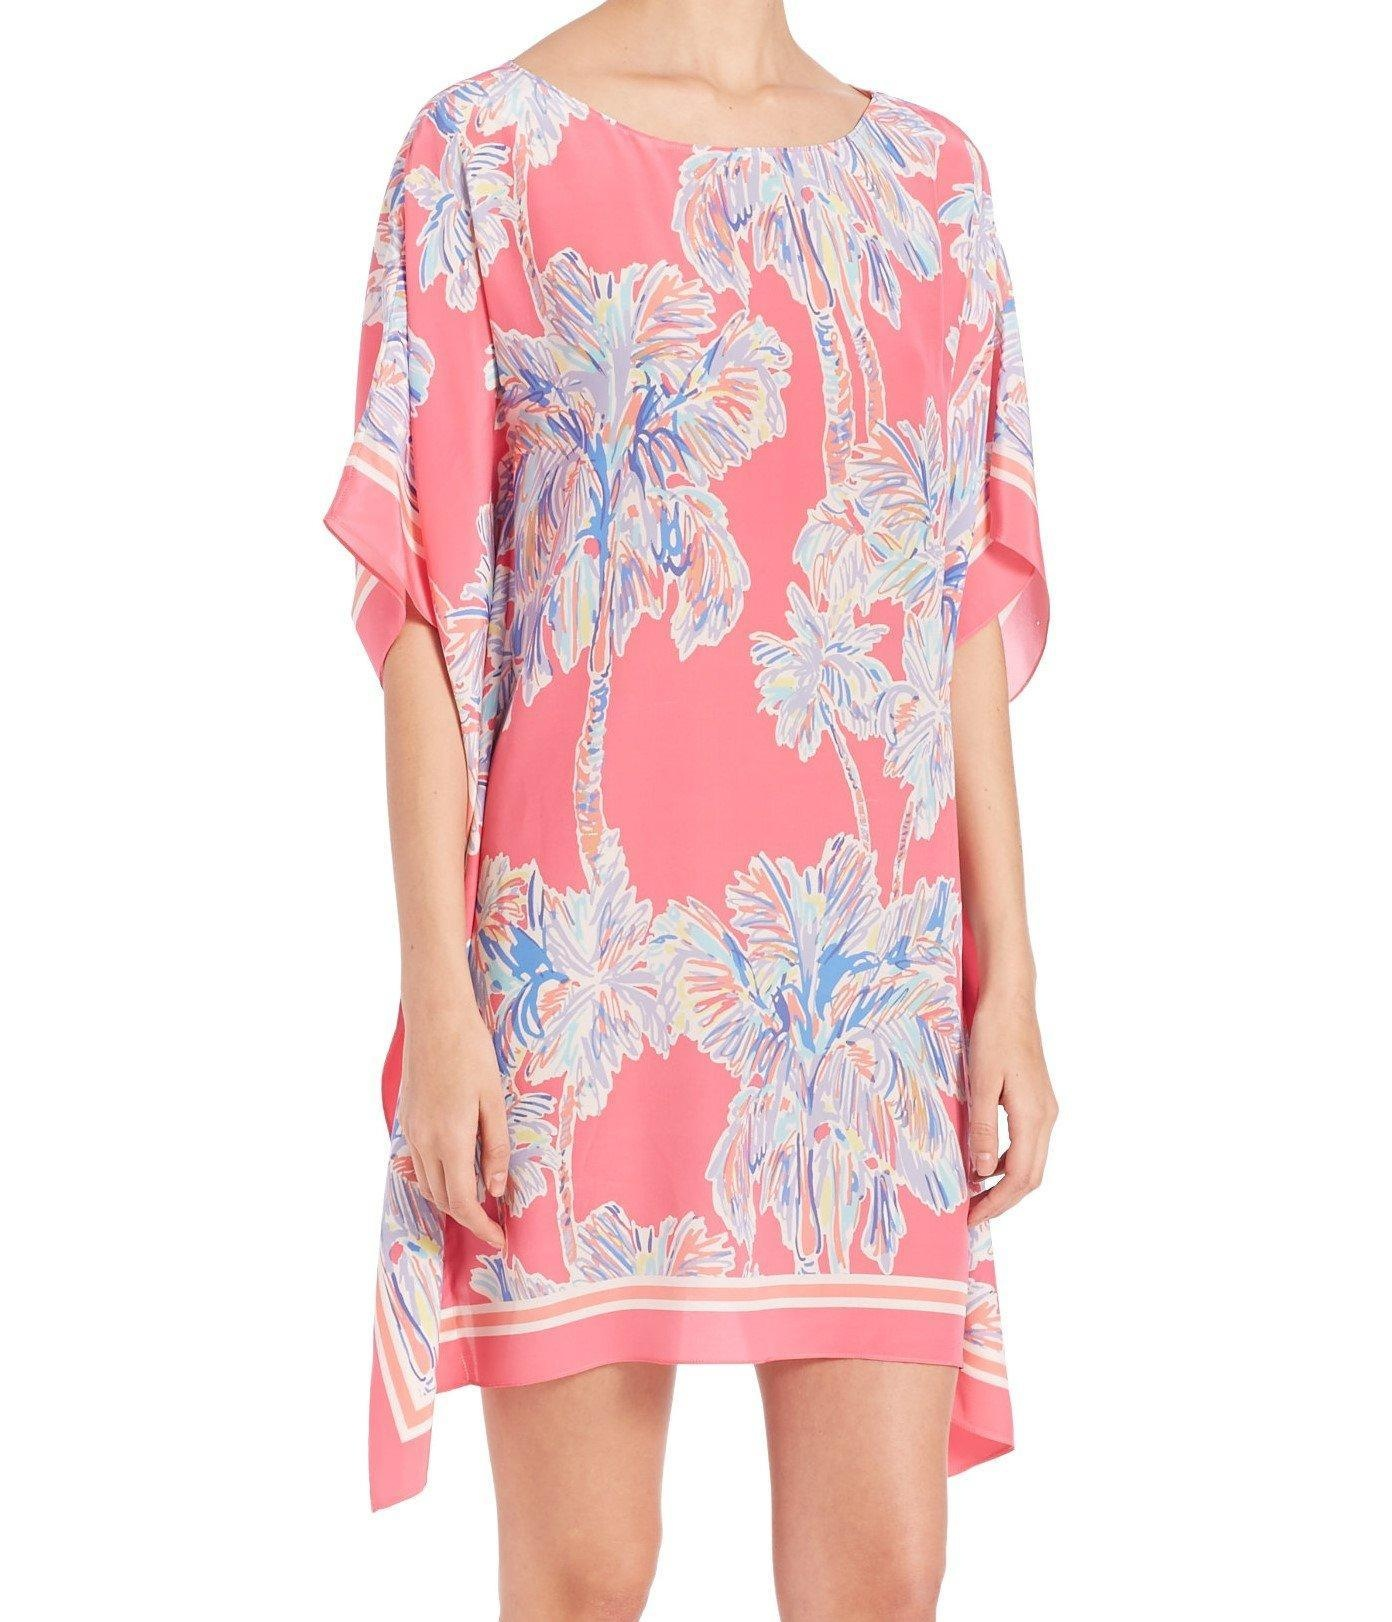 cefb7a0694eae3 Online Store: Lilly Pulitzer Lindamarie Silk Caftan Dress Flamingo Pink  Nice Stems Xxs